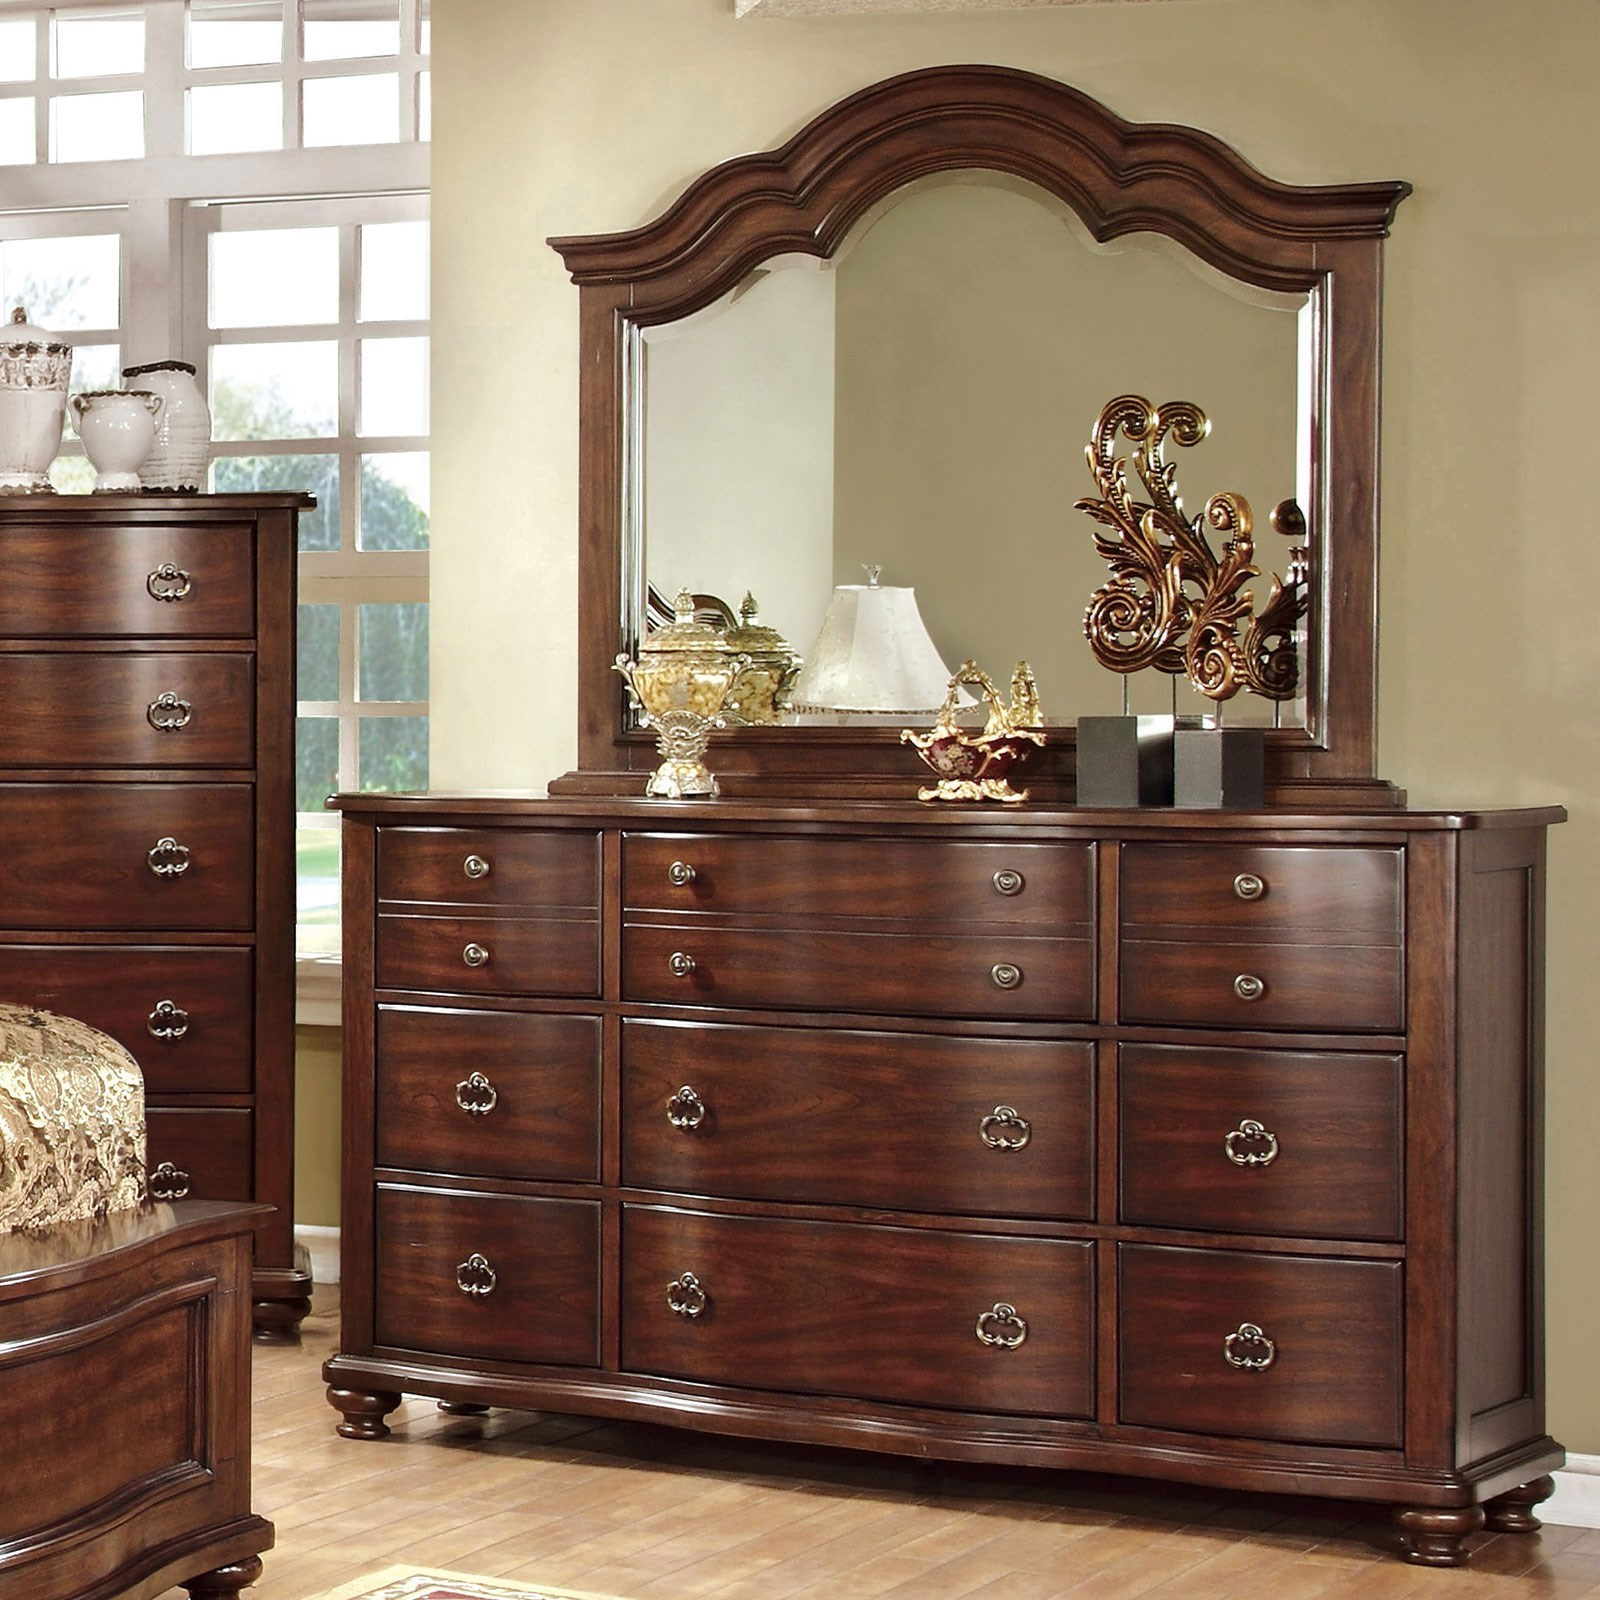 Bellavista Dresser at Household Furniture